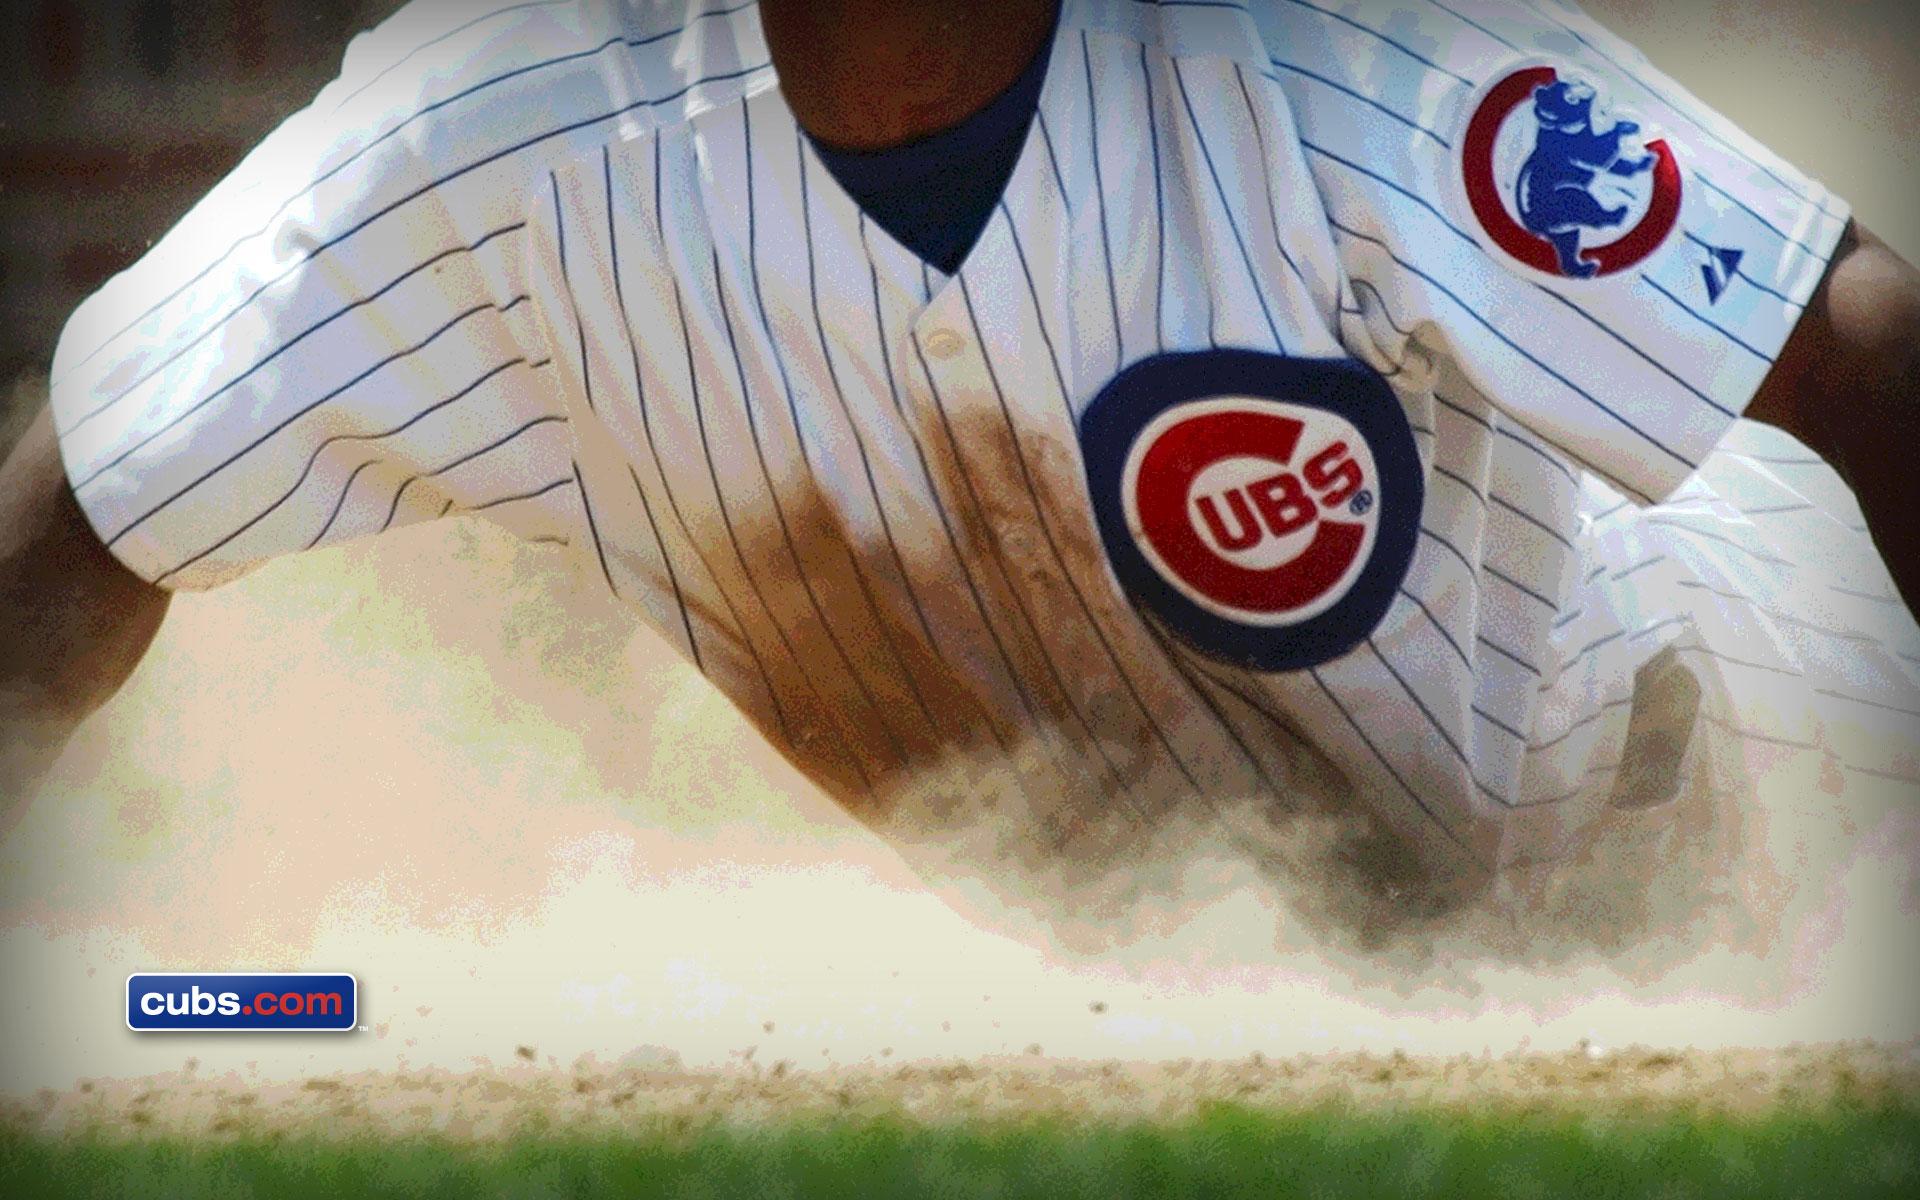 Cubs Wallpaper for your Desktop Chicago Cubs 1920x1200